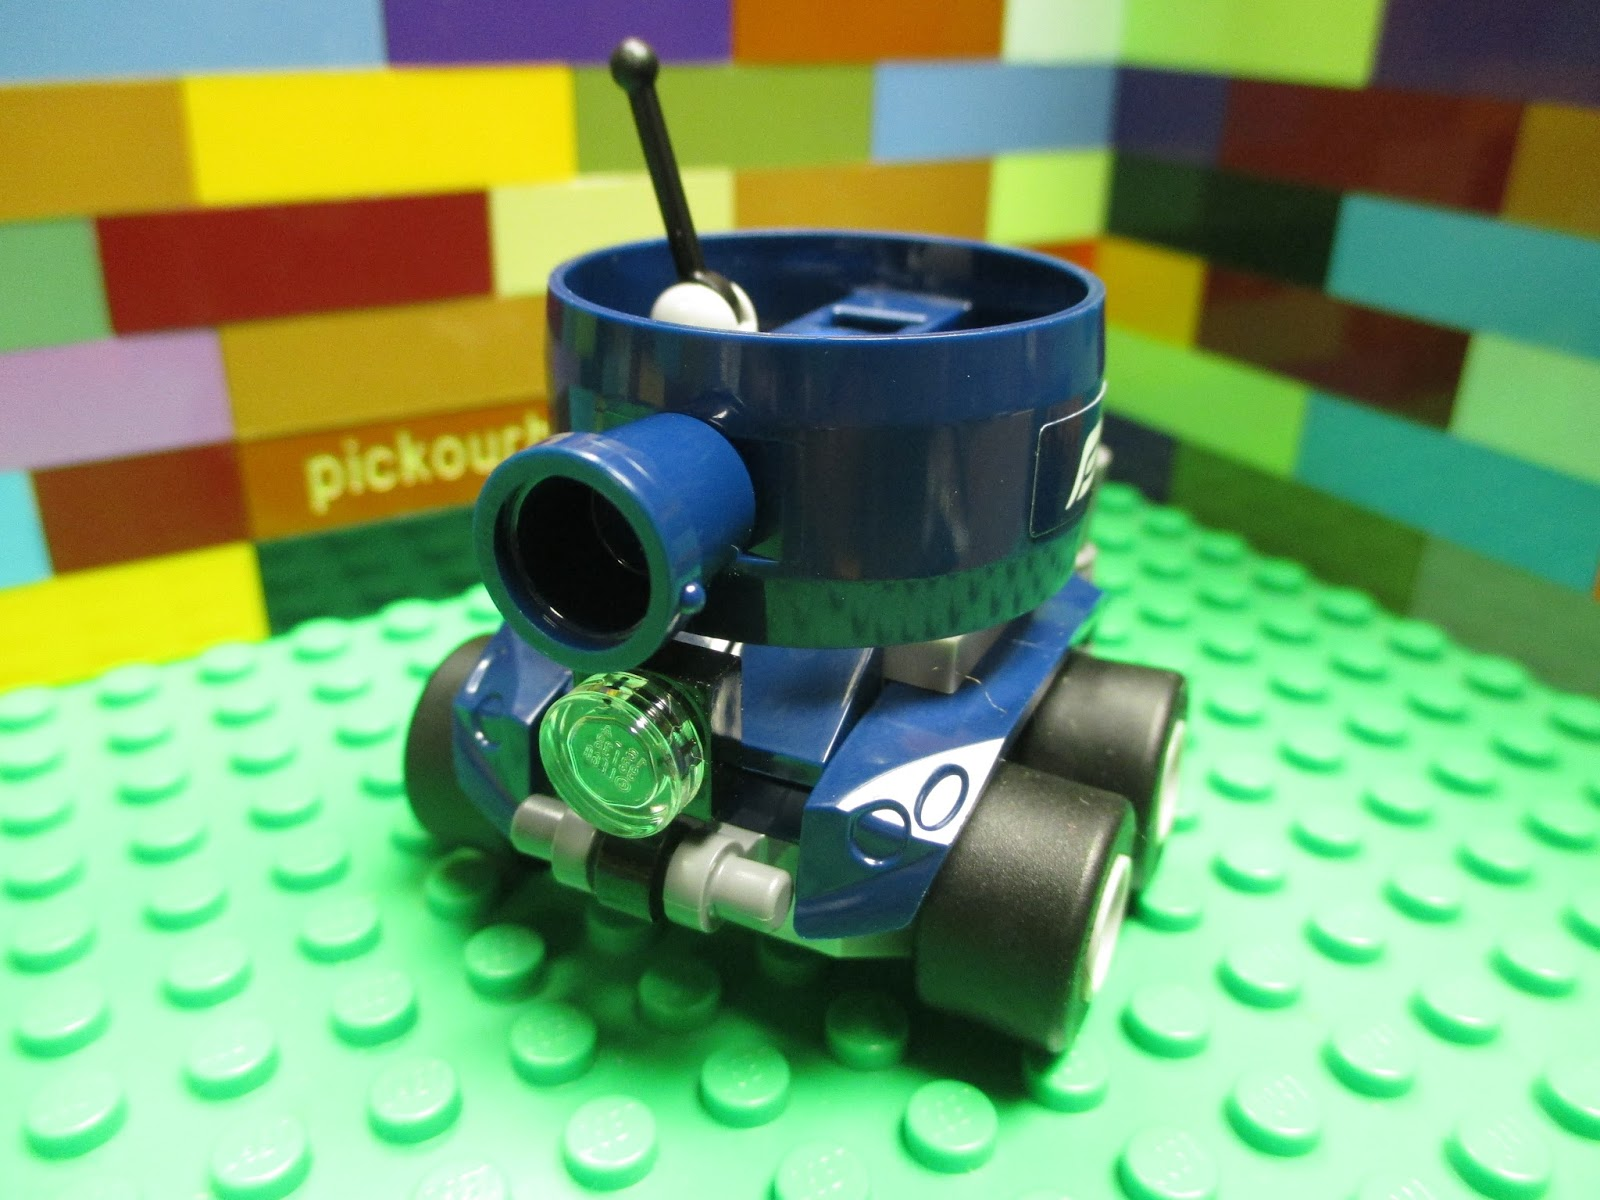 NEW 2x4x2 Transparent Blue Vehicle Car Windscreen LEGO 3823 2 Per Order